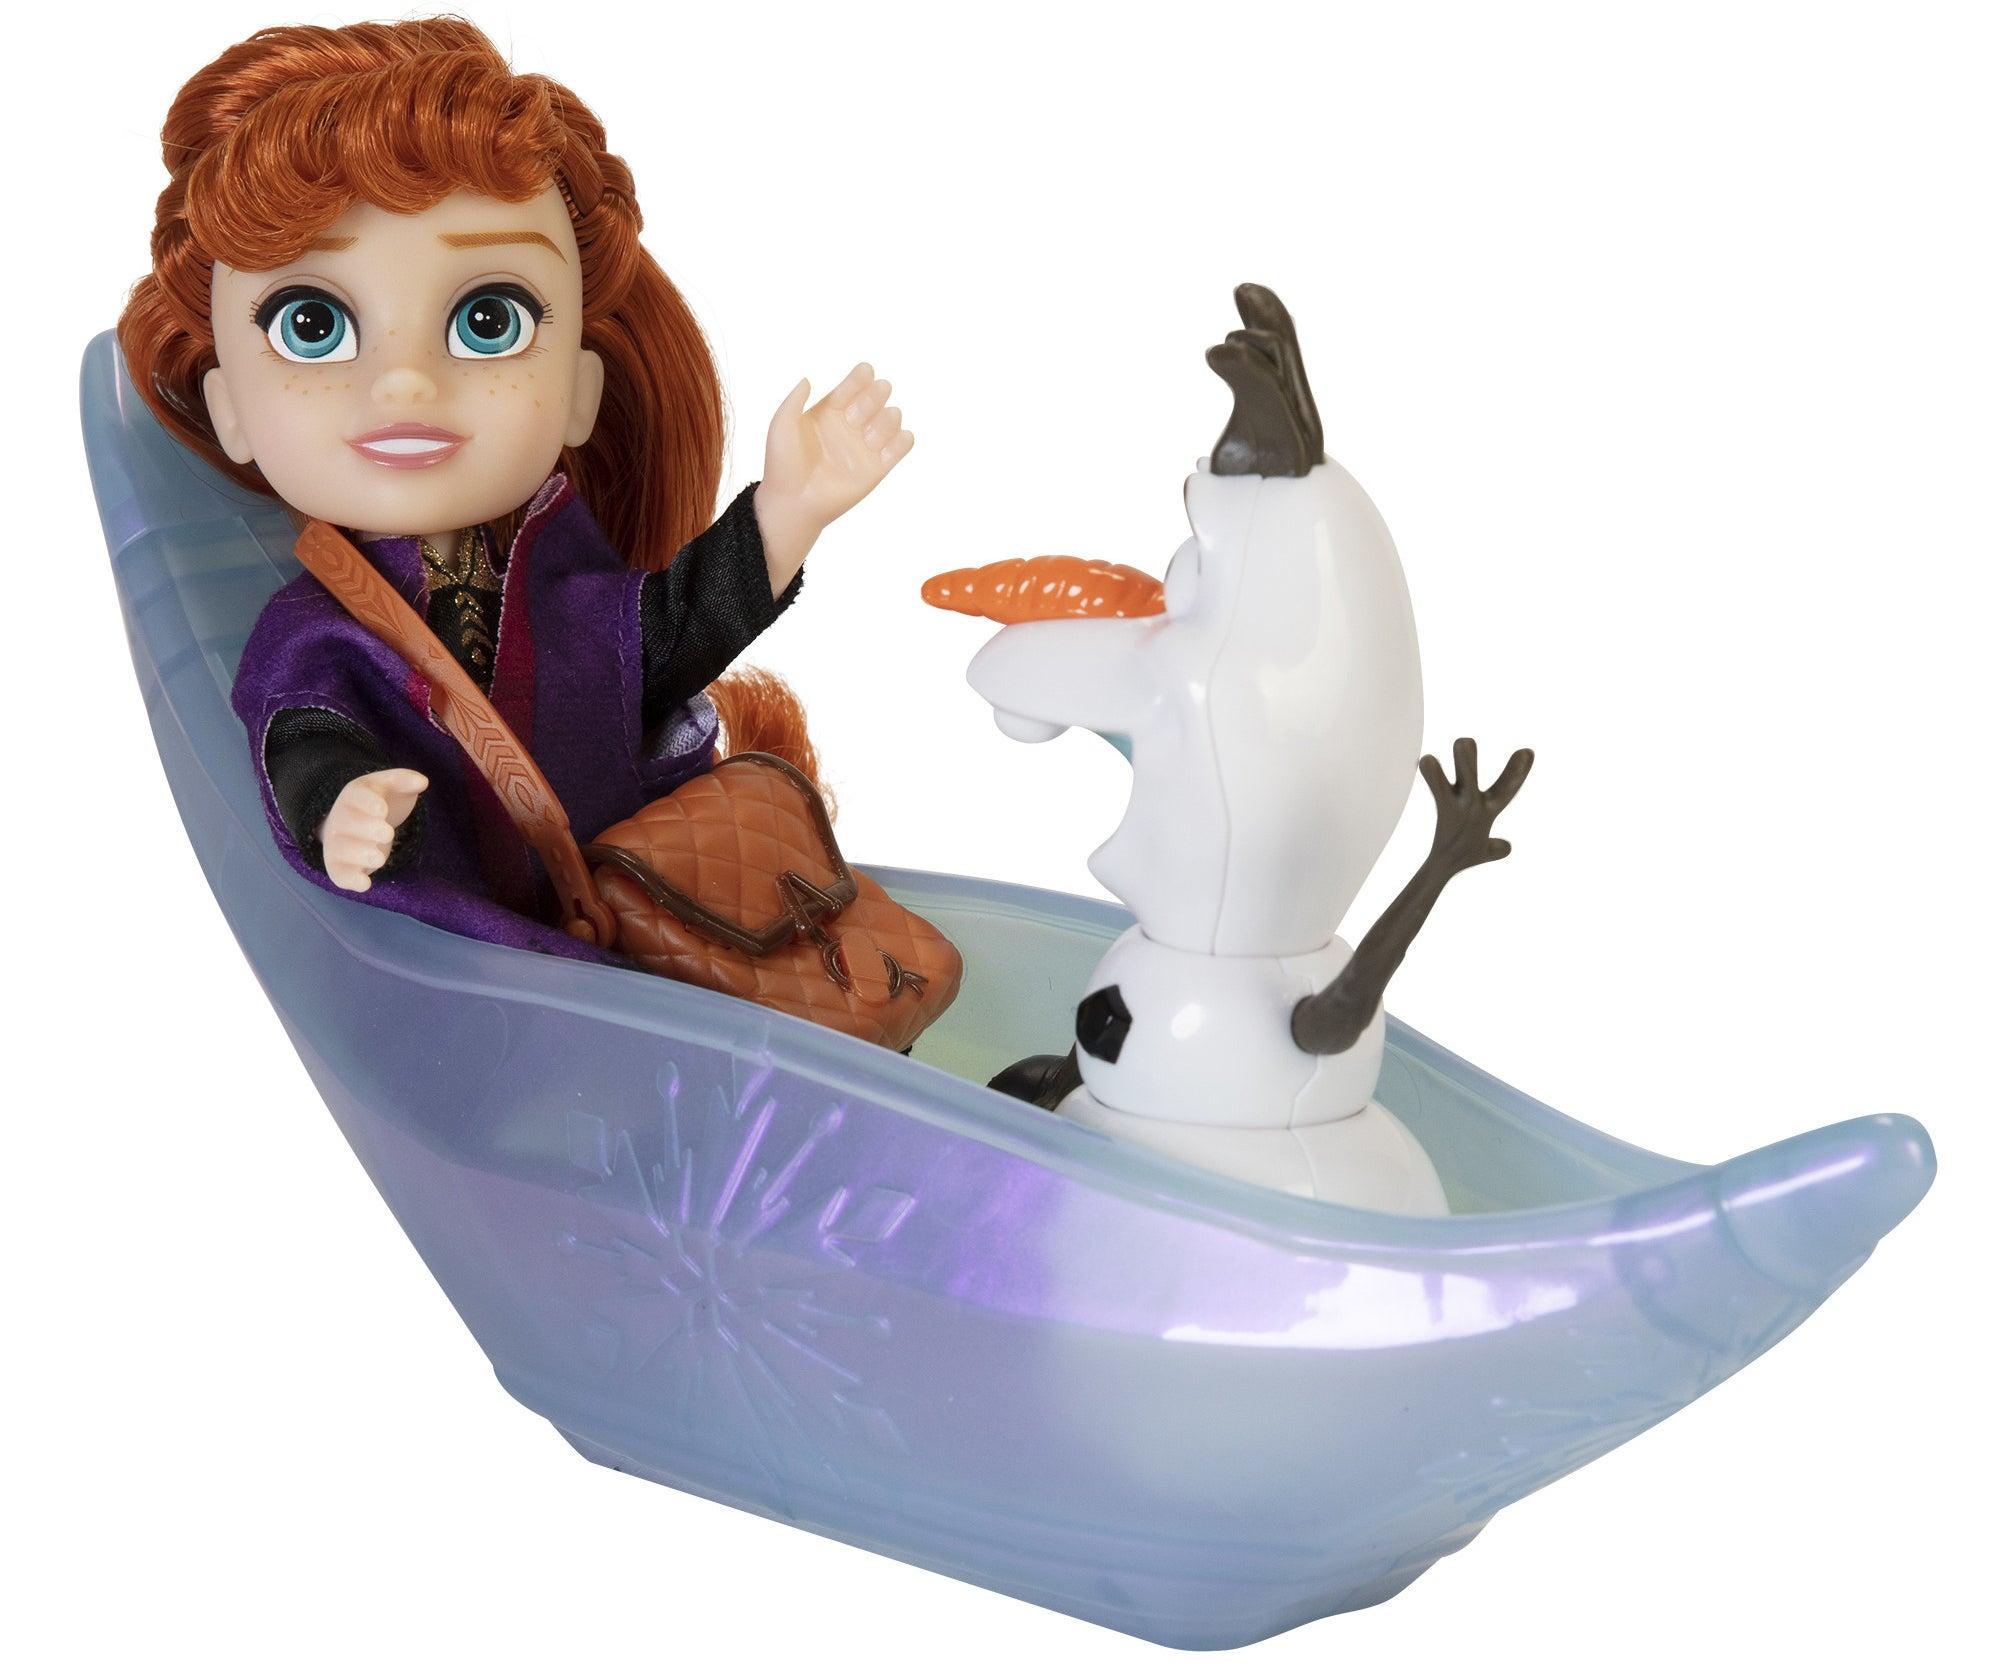 Anna and Olaf in ice canoe